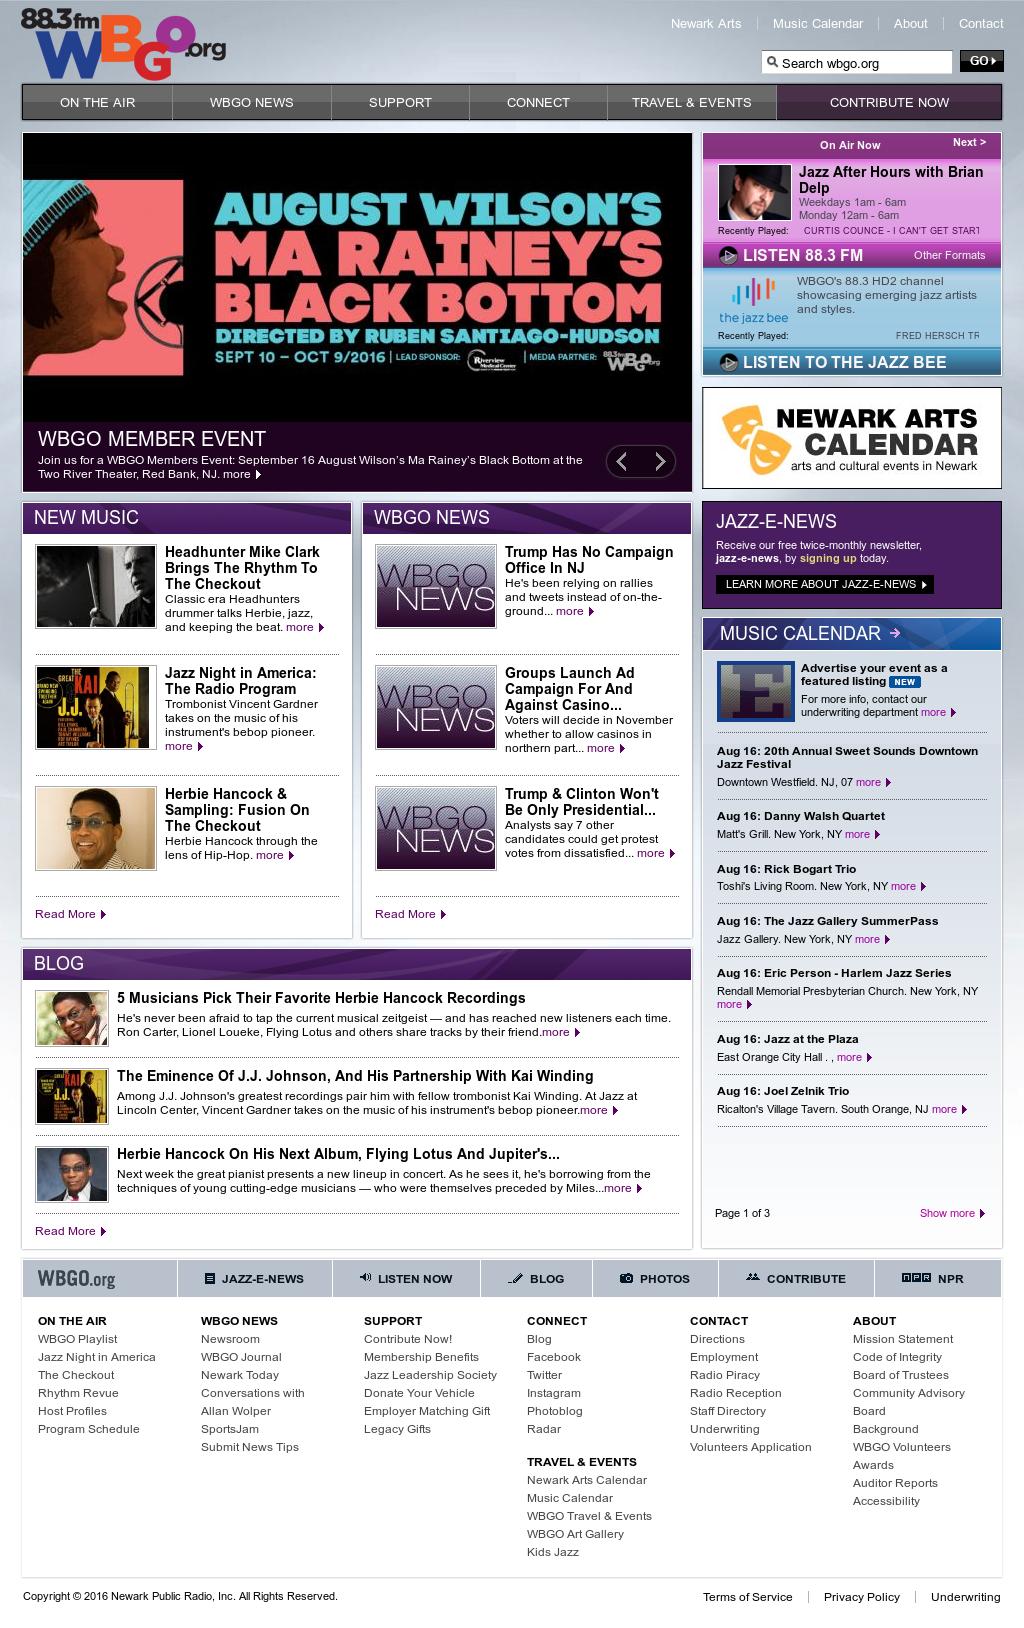 WBGO-FM Competitors, Revenue and Employees - Owler Company Profile